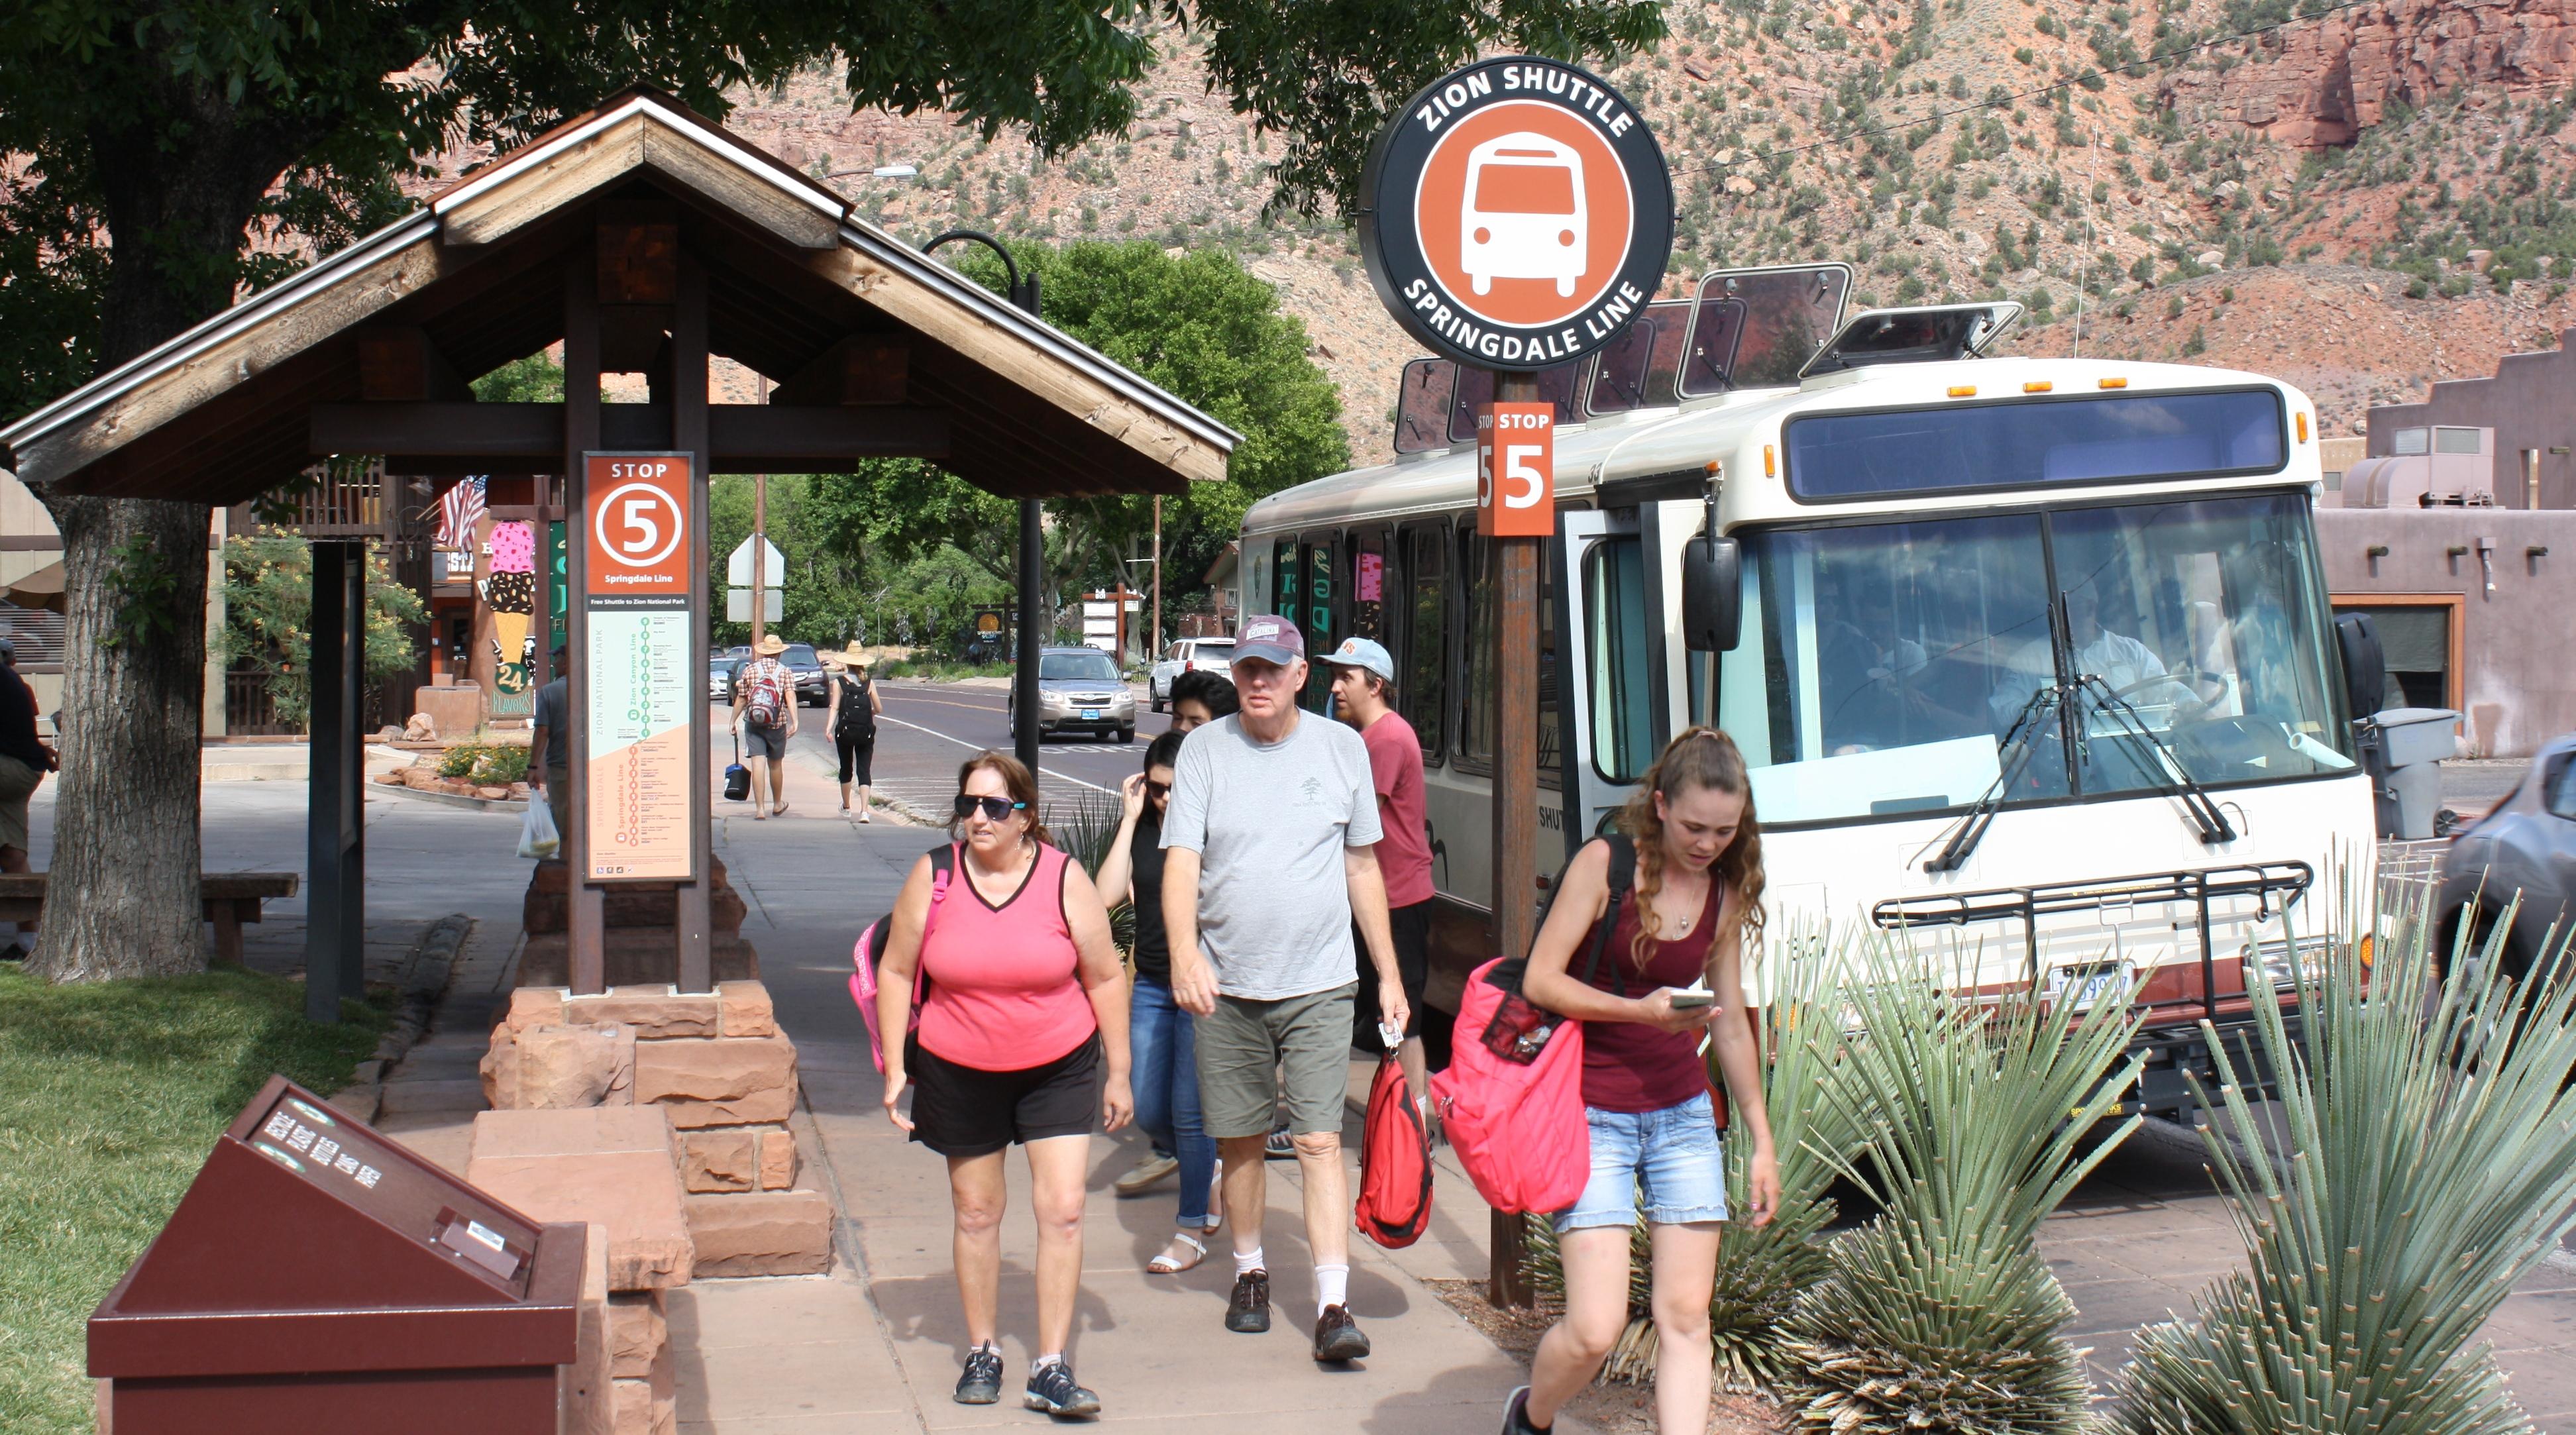 Visitors disembark the Springdale Shuttle, Springdale, Utah, July 20, 2016 | Photo by Reuben Wadsworth, St. George News